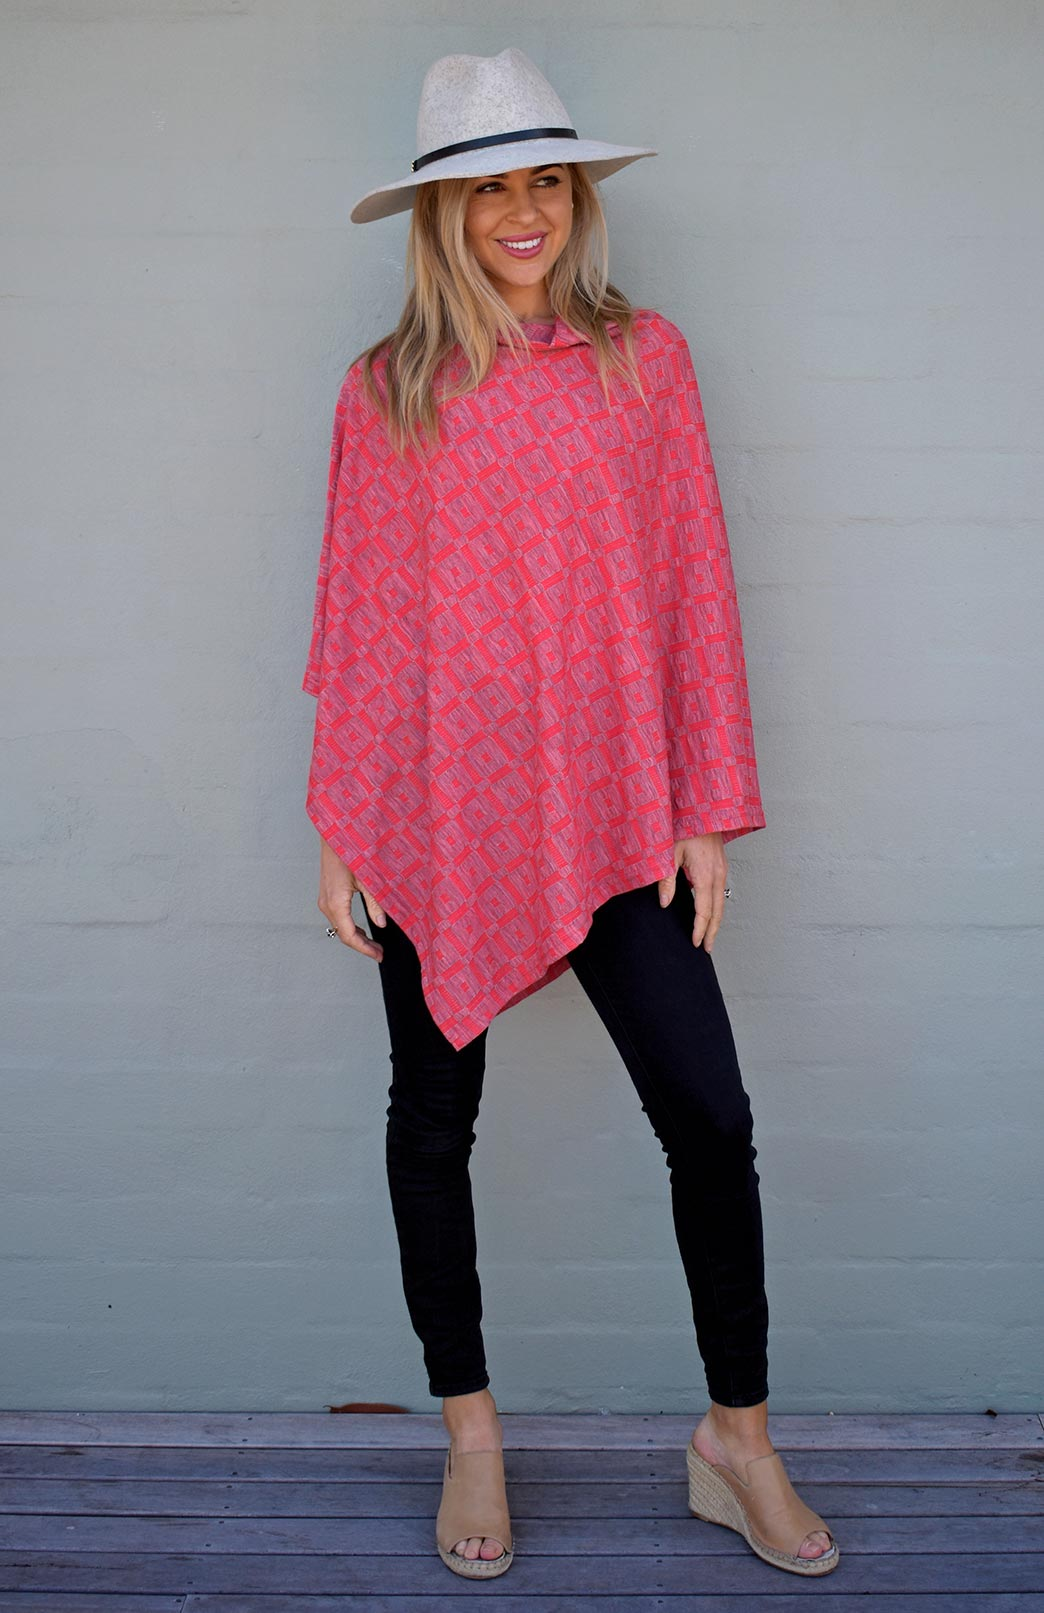 46c22528bf1882 Wool Ponchos for Women | Smitten Merino Tasmania Australia